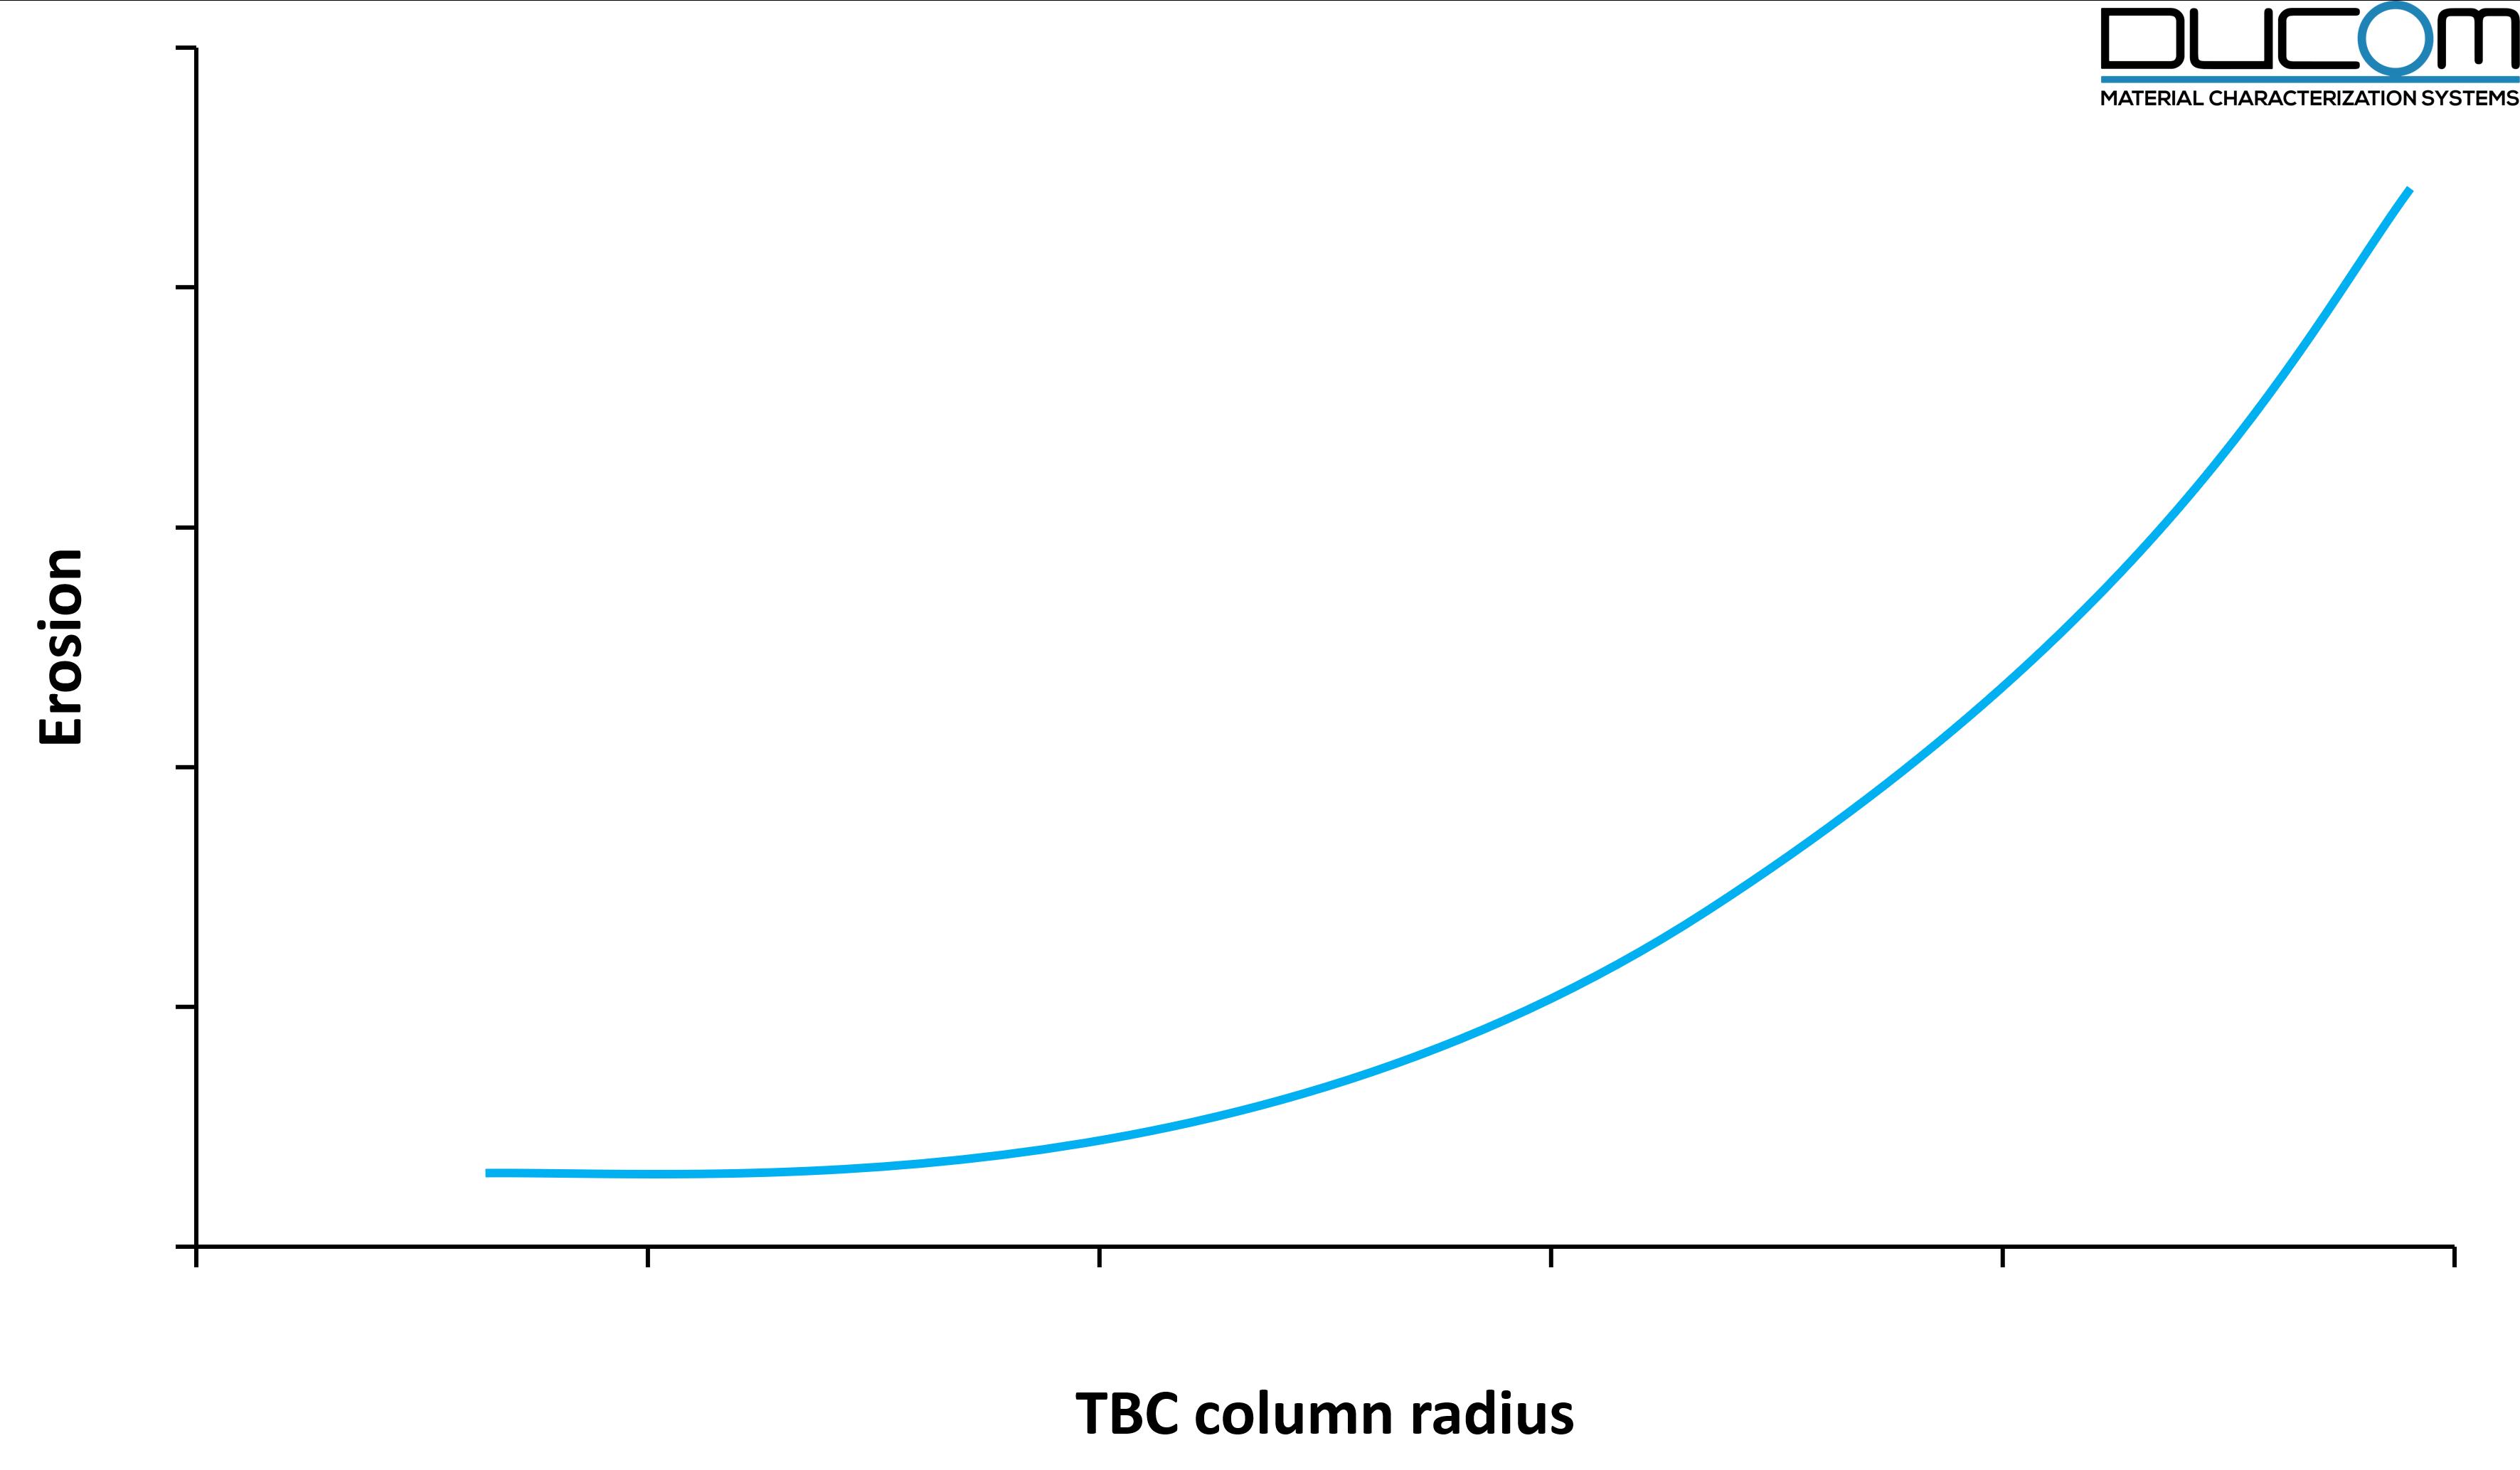 Erosion of TBCs with respect to TBC column radius